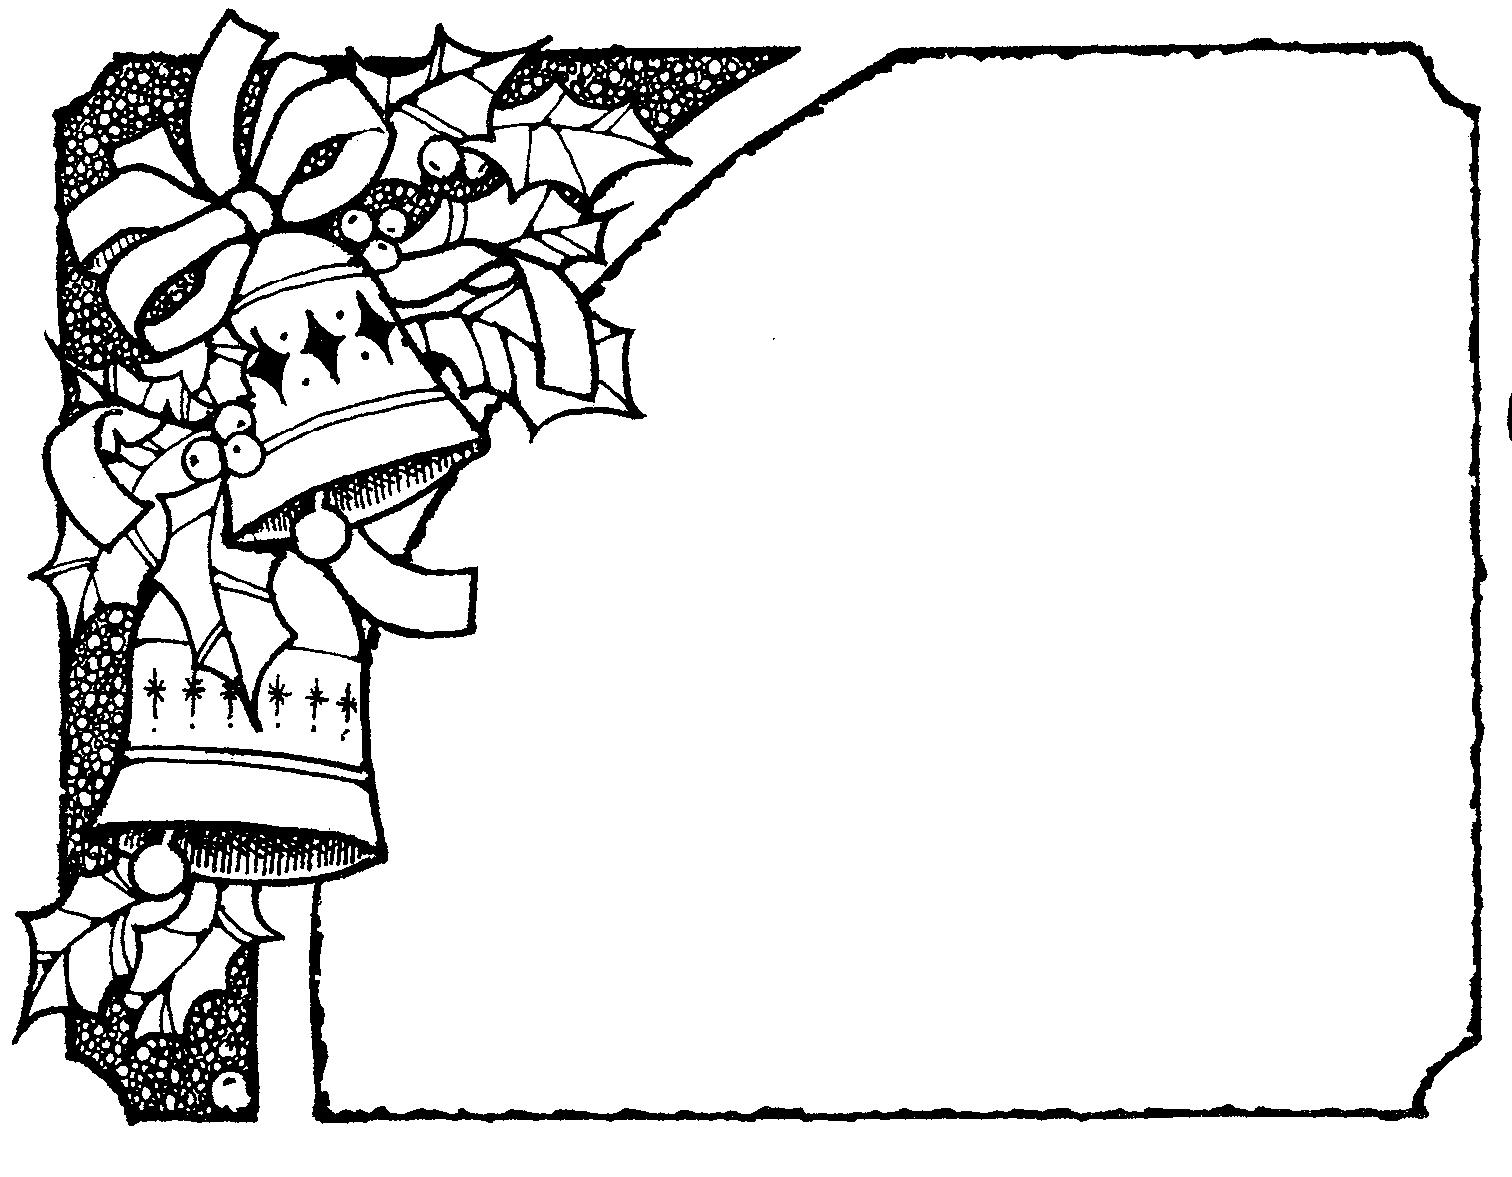 1512x1177 Free Merry Christmas Clip Art, Xmas Tree Graphics Borders